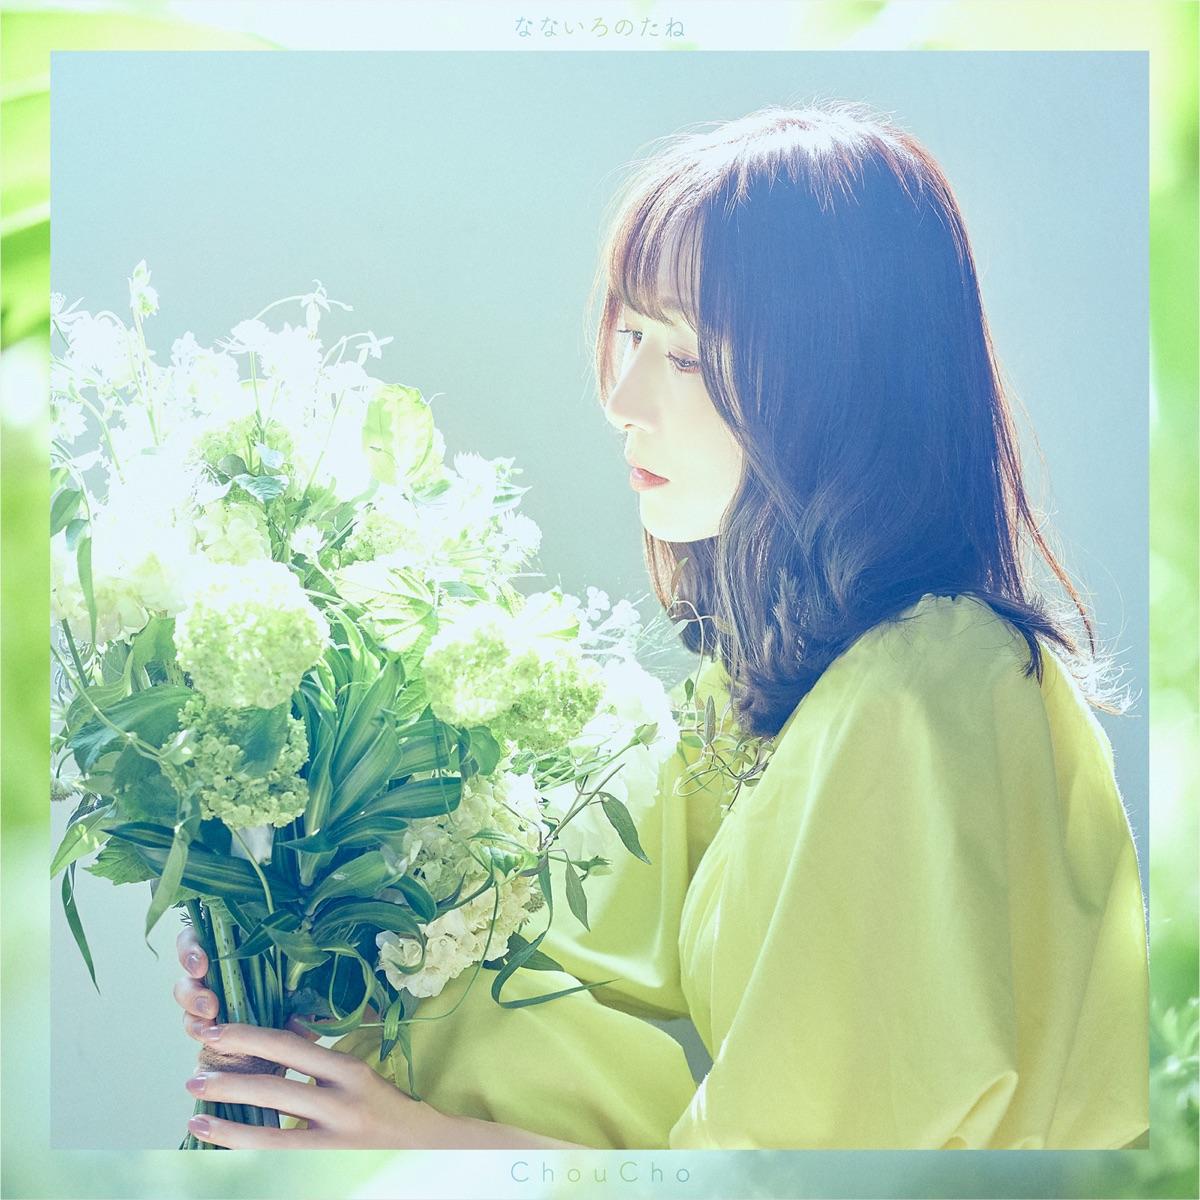 Cover for『ChouCho - Nanairo no Tane』from the release『Nanairo no Tane』